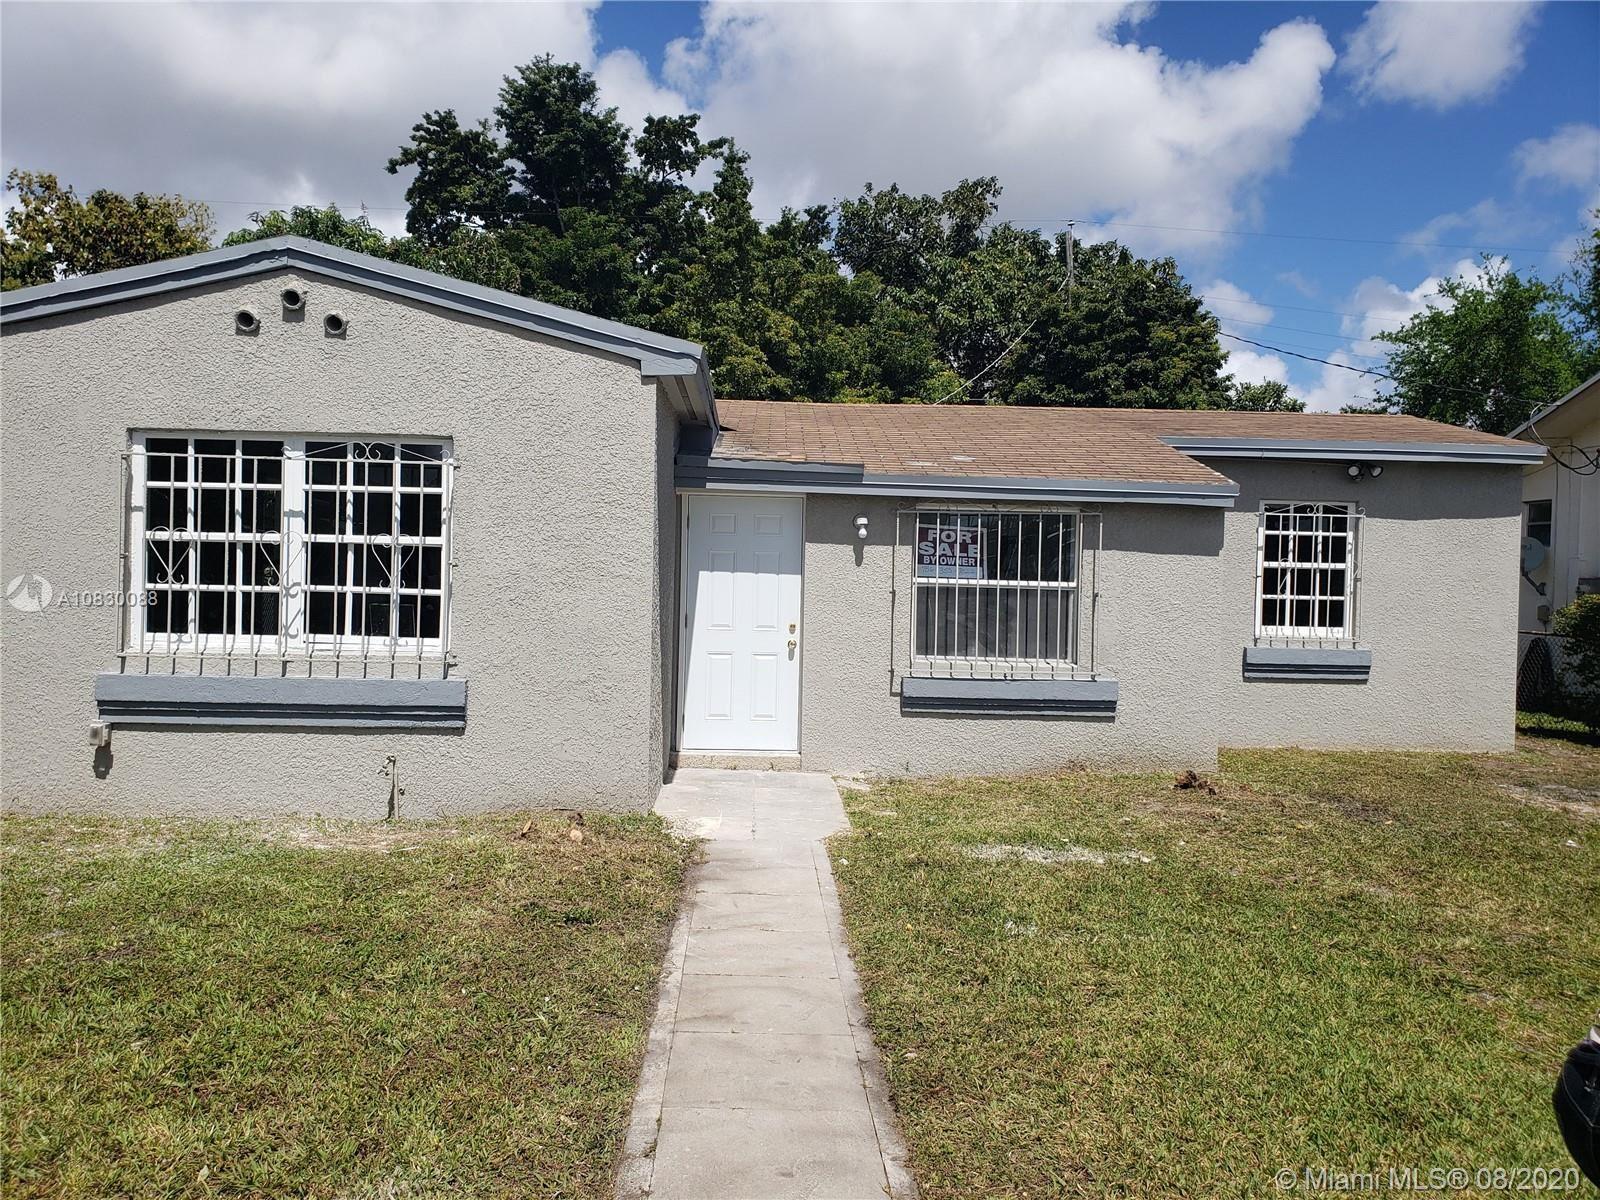 1021 NW 73rd St, Miami, FL 33150 - #: A10830088